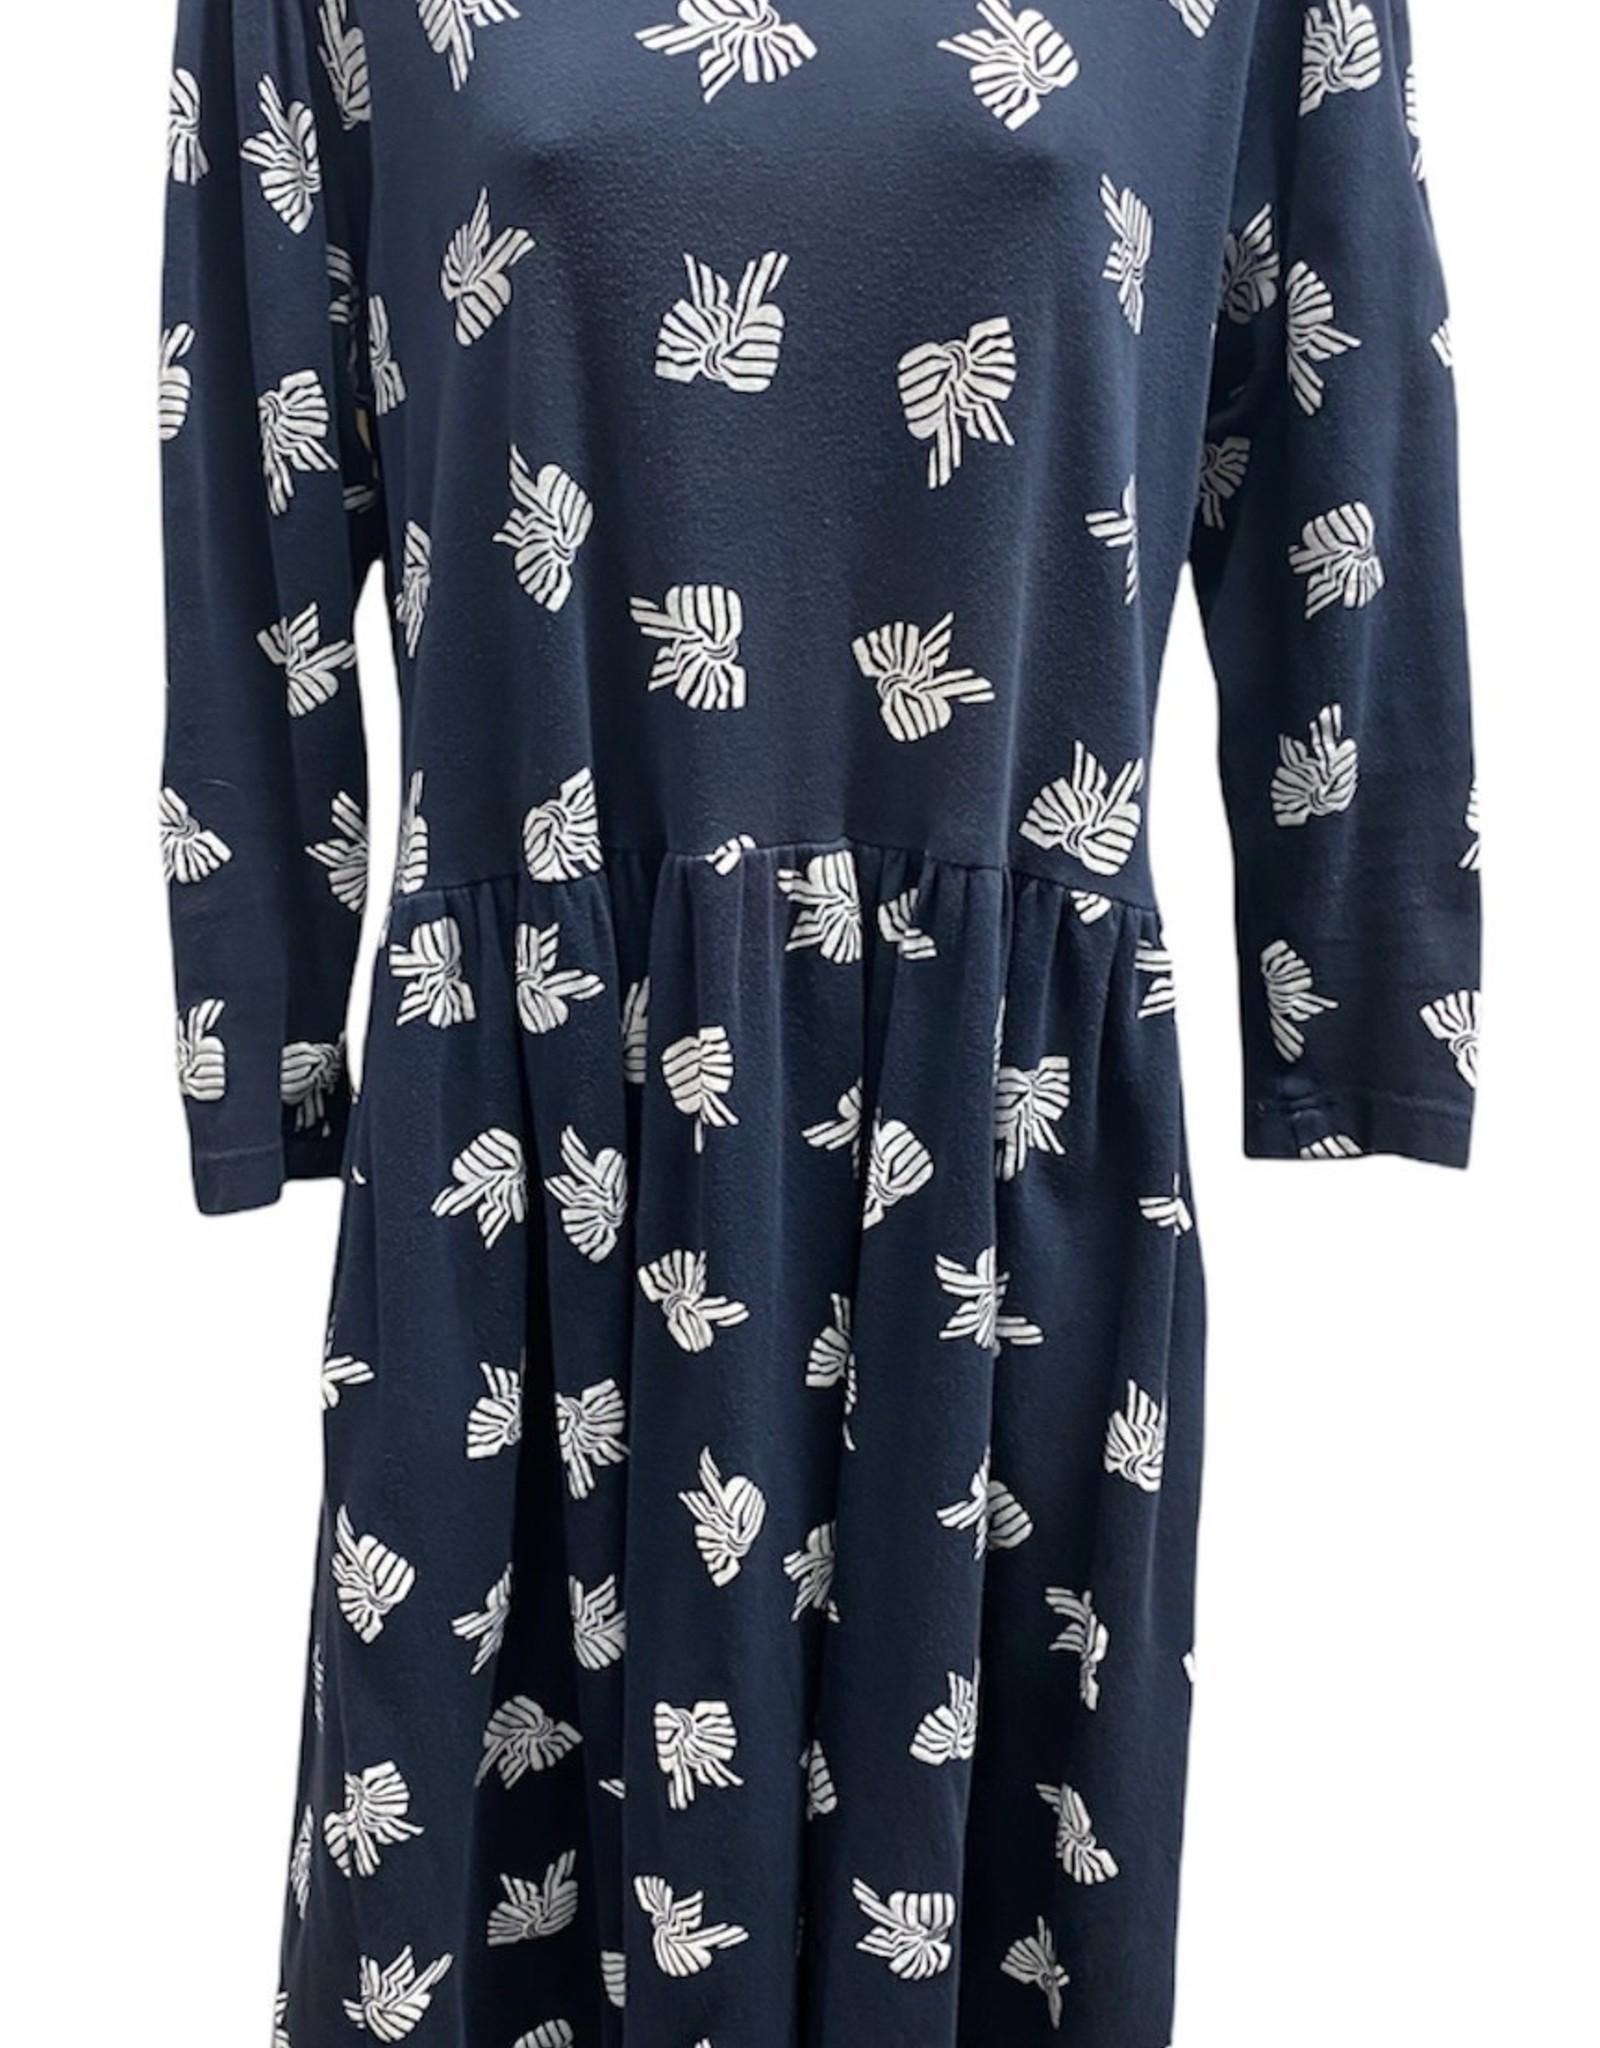 80s navy print dress bow detail